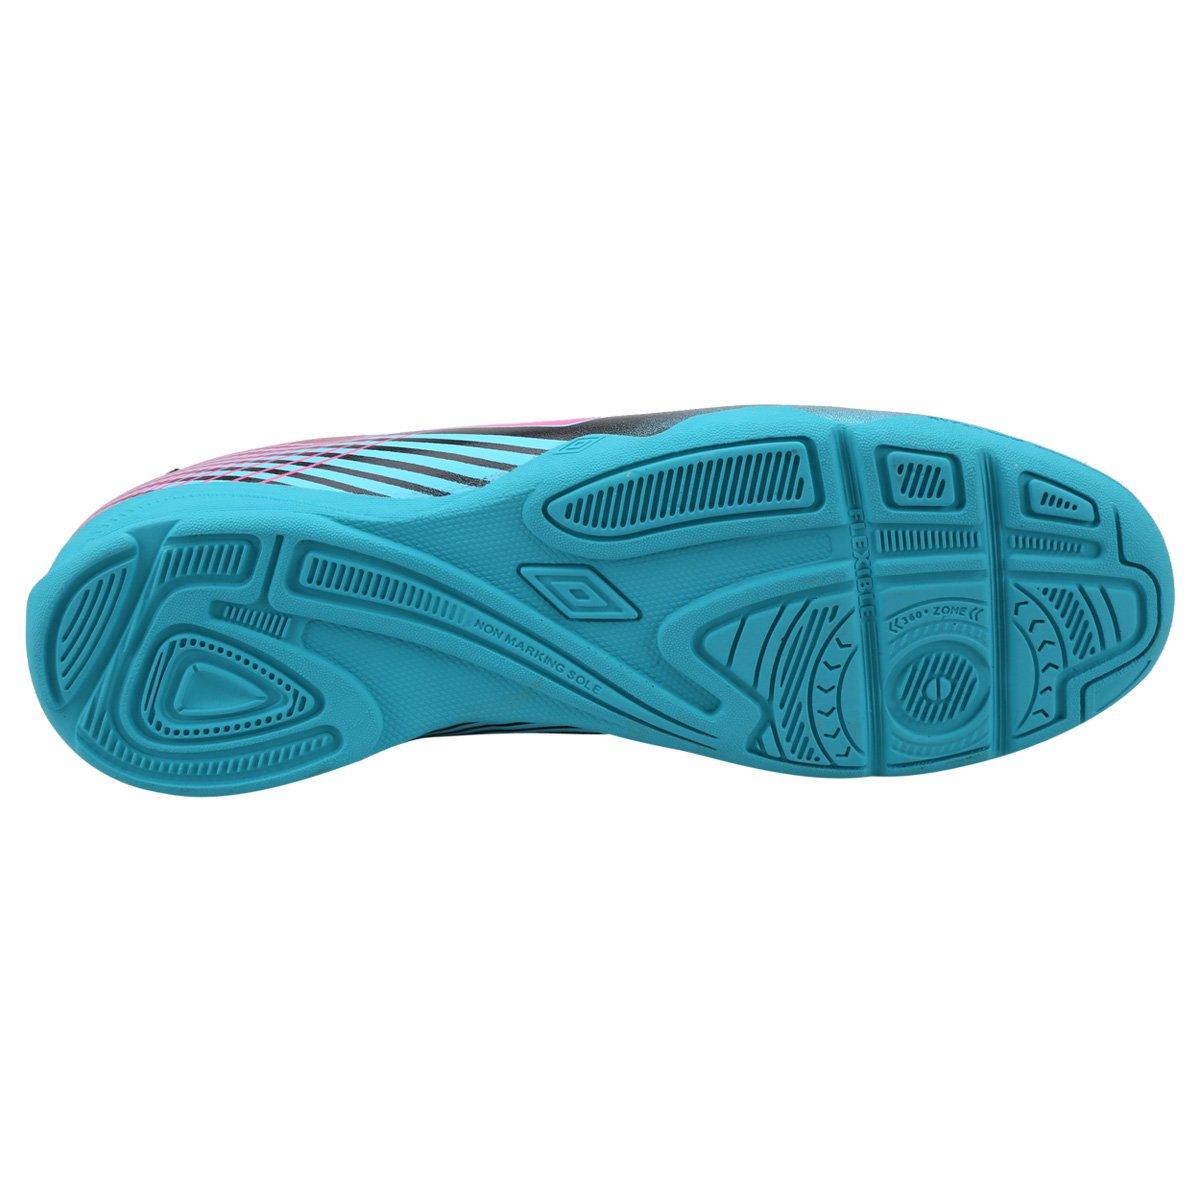 Chuteira Futsal Umbro Slice 3 Masculina - Azul e Rosa - Compre Agora ... 7e808af4307ba